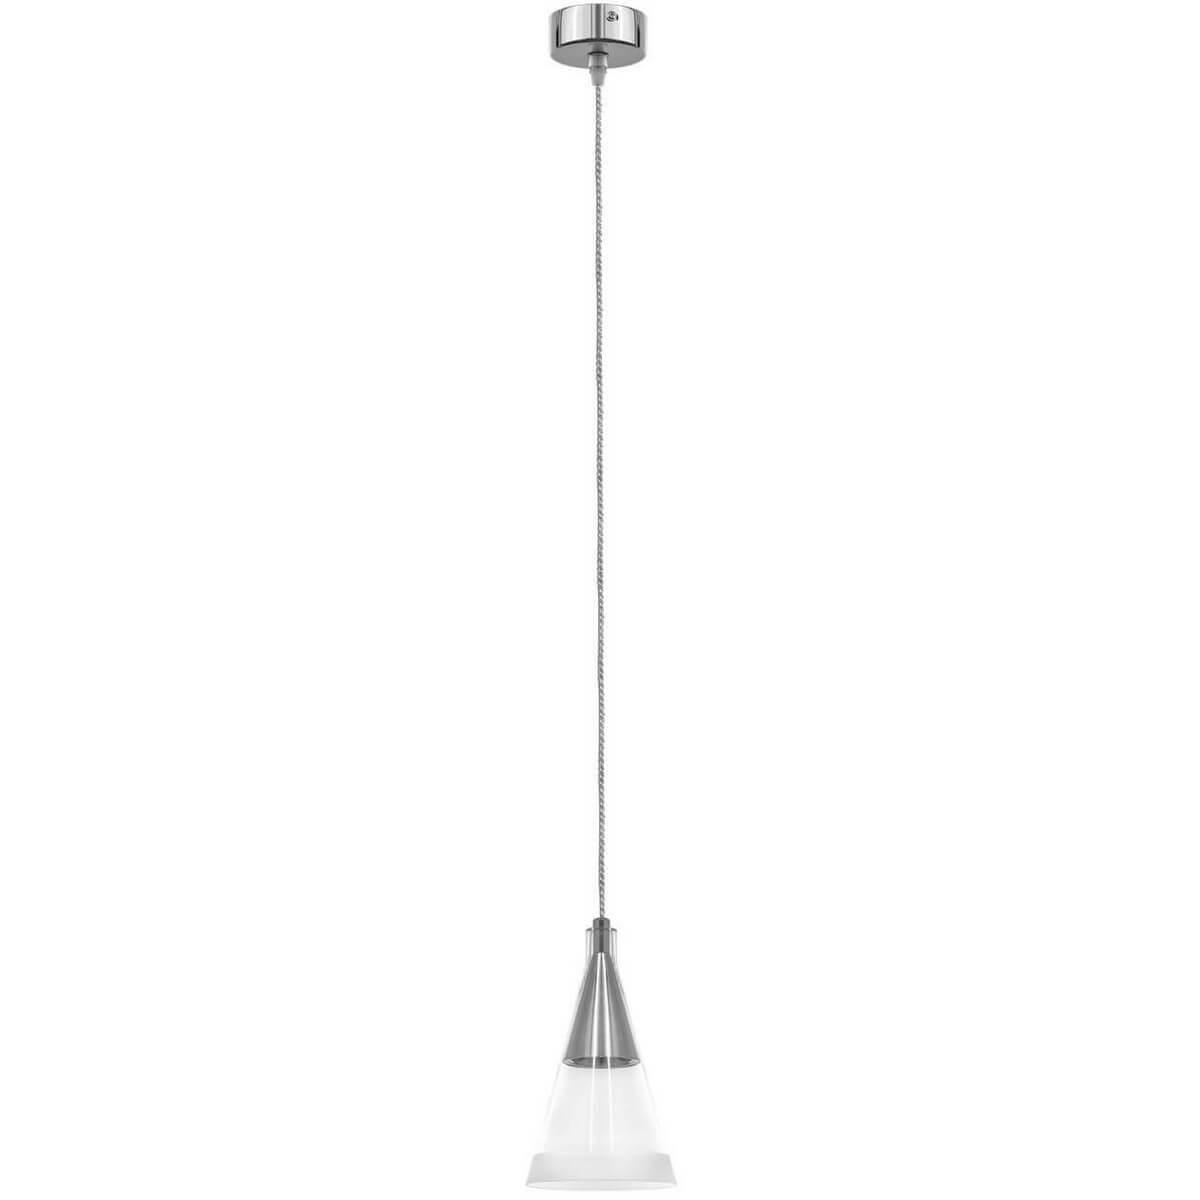 Светильник Lightstar 757019 Cone